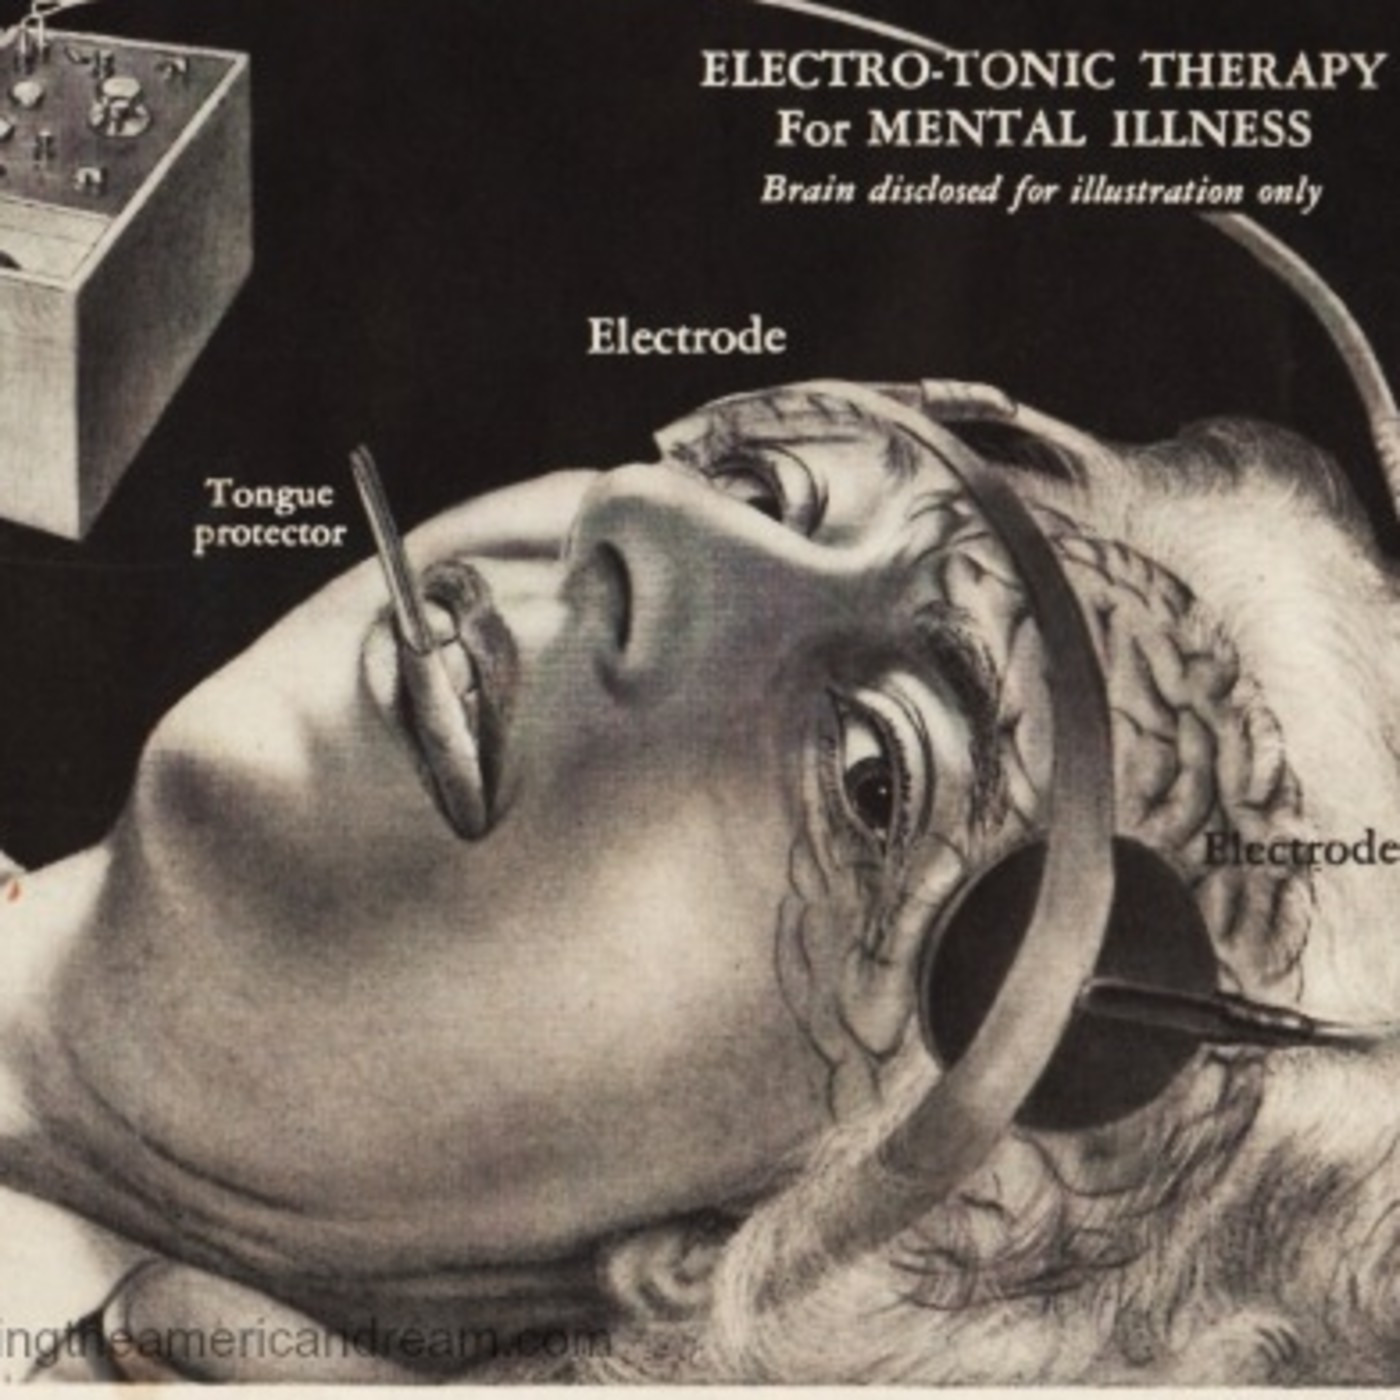 El electroshock